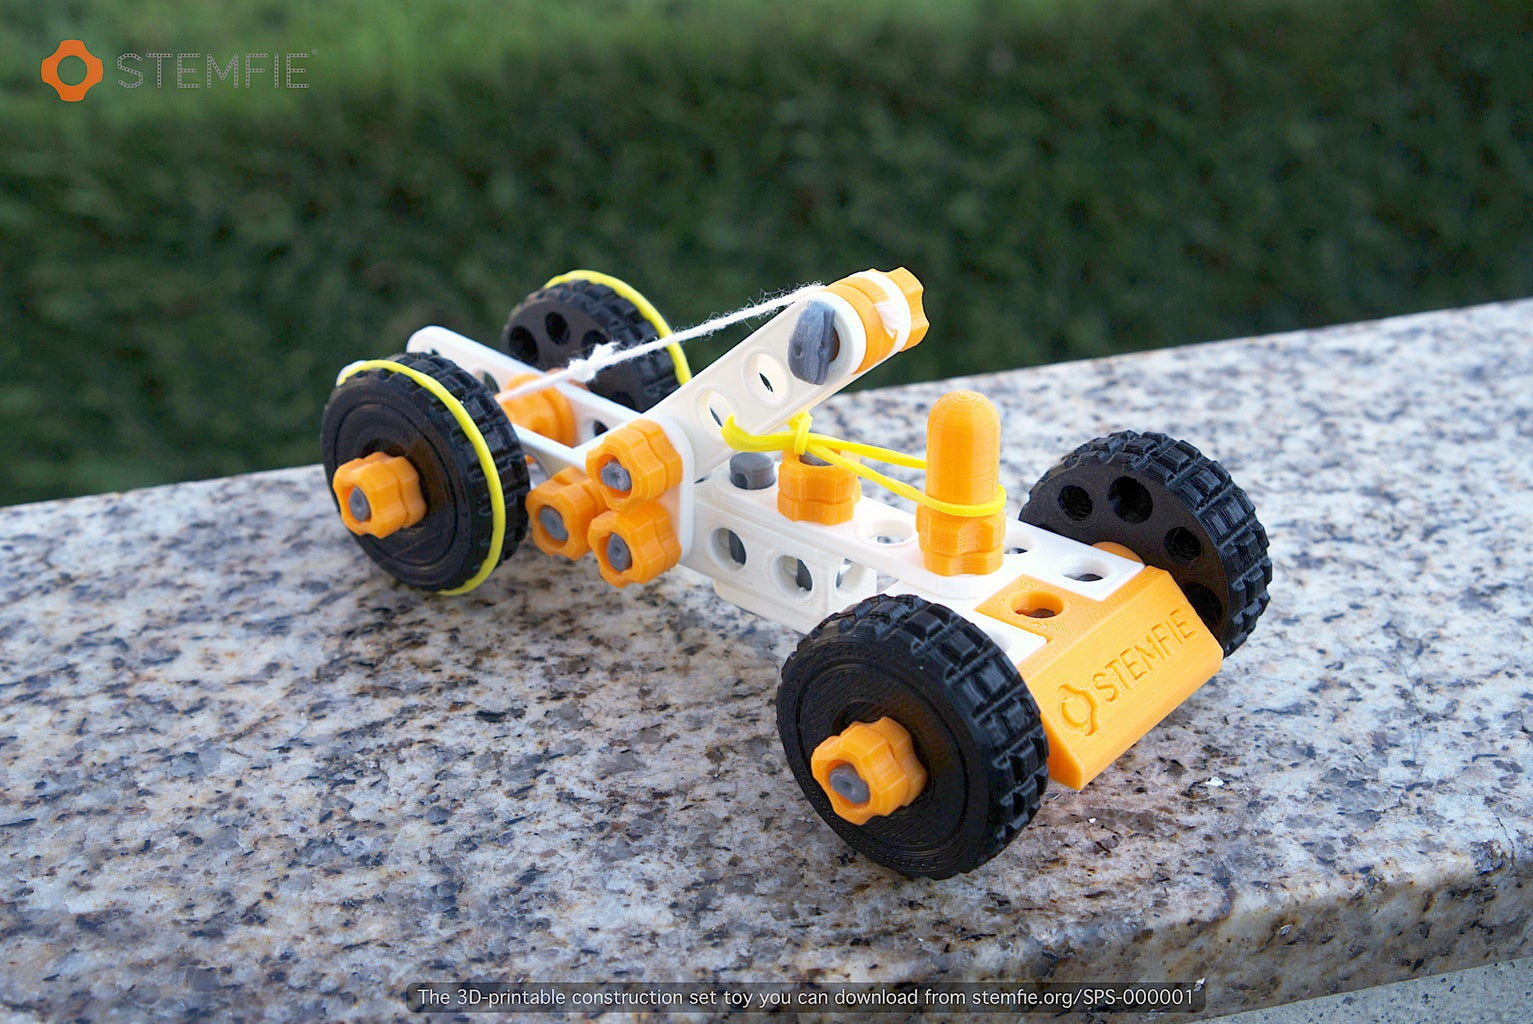 The Final Assembled STEMFIE Car